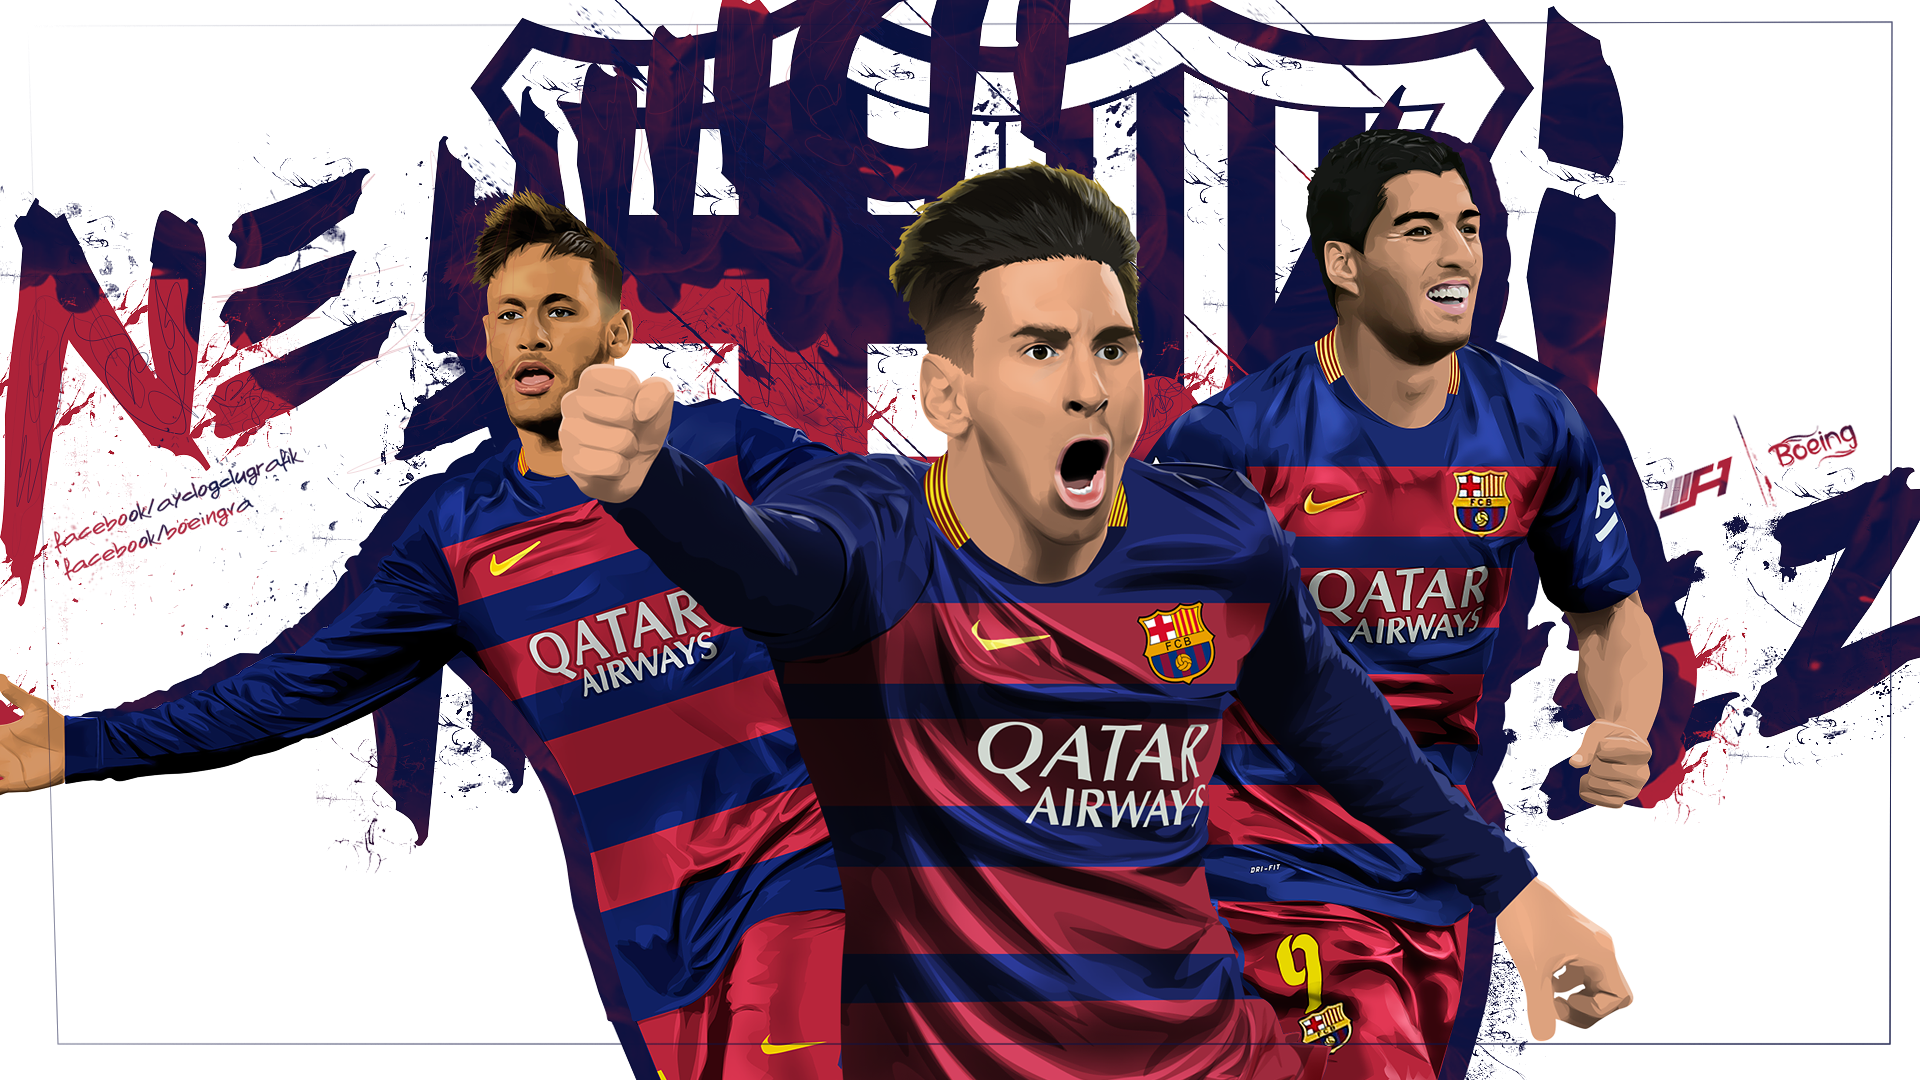 Neymar Messi Suarez Poster images 1920x1080